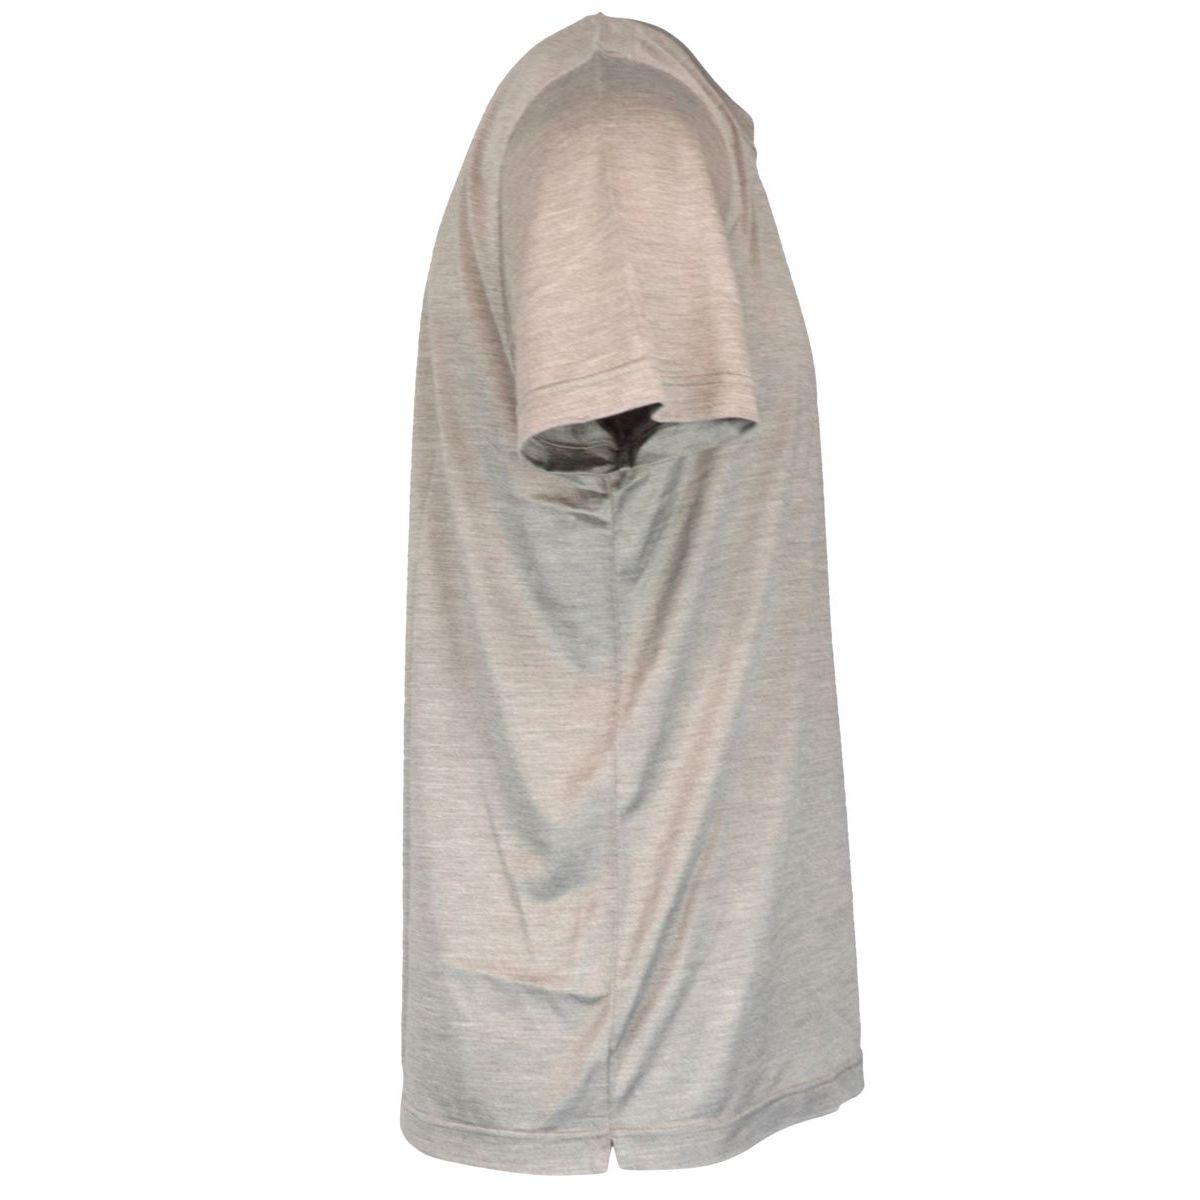 Short-sleeved silk crew-neck t-shirt Tortora Gran Sasso